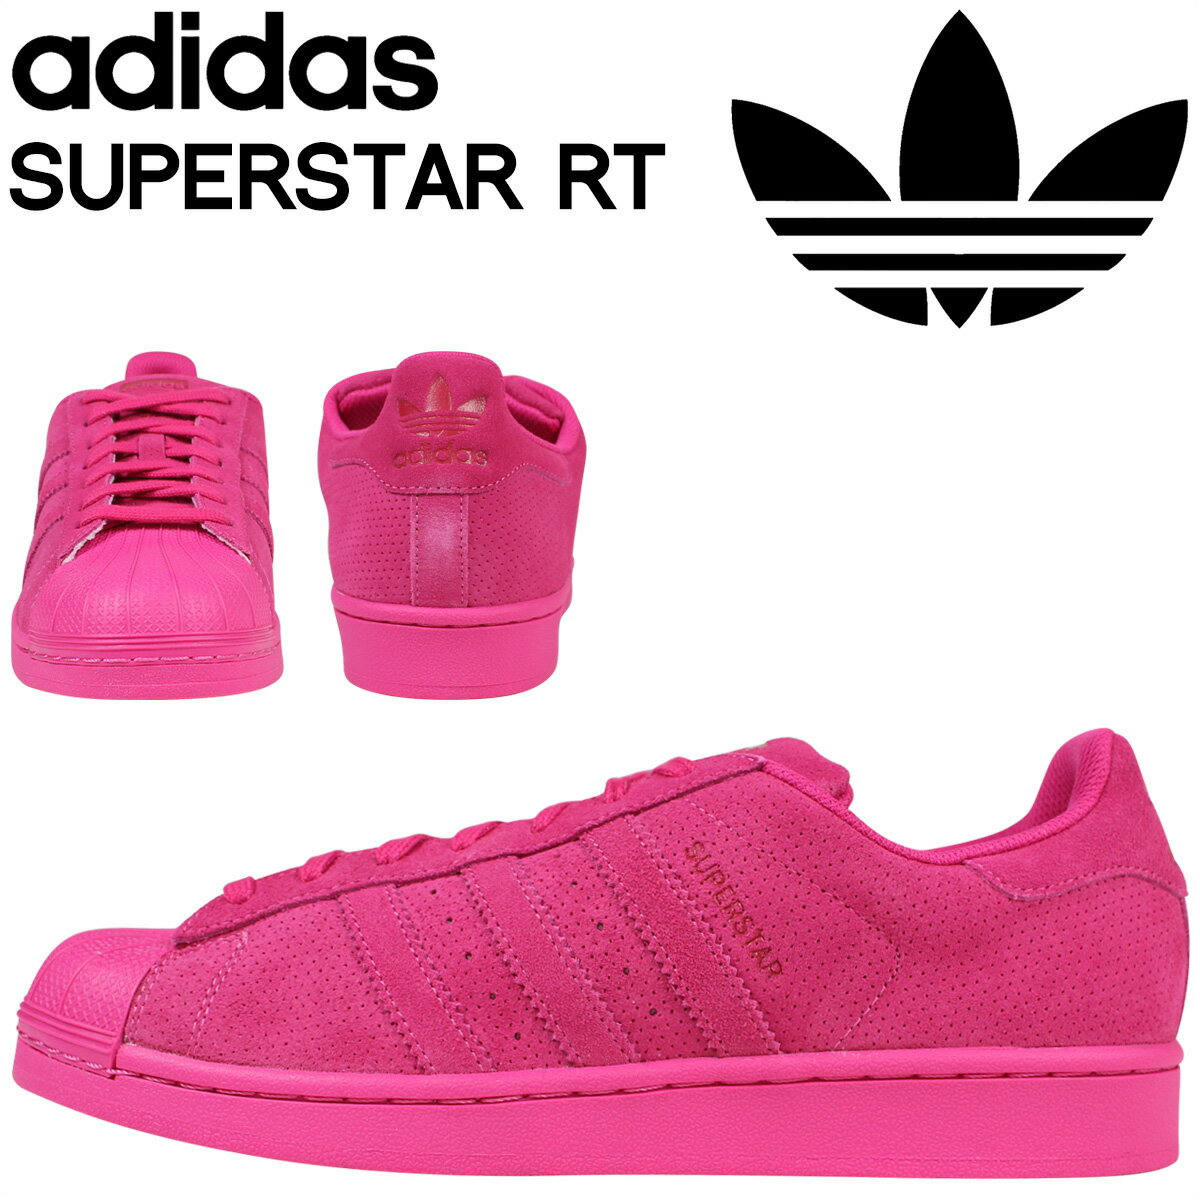 adidas Originals アディダス オリジナルス スーパースター スニーカー SUPERSTAR RT AQ4166 メンズ 靴 ピンク